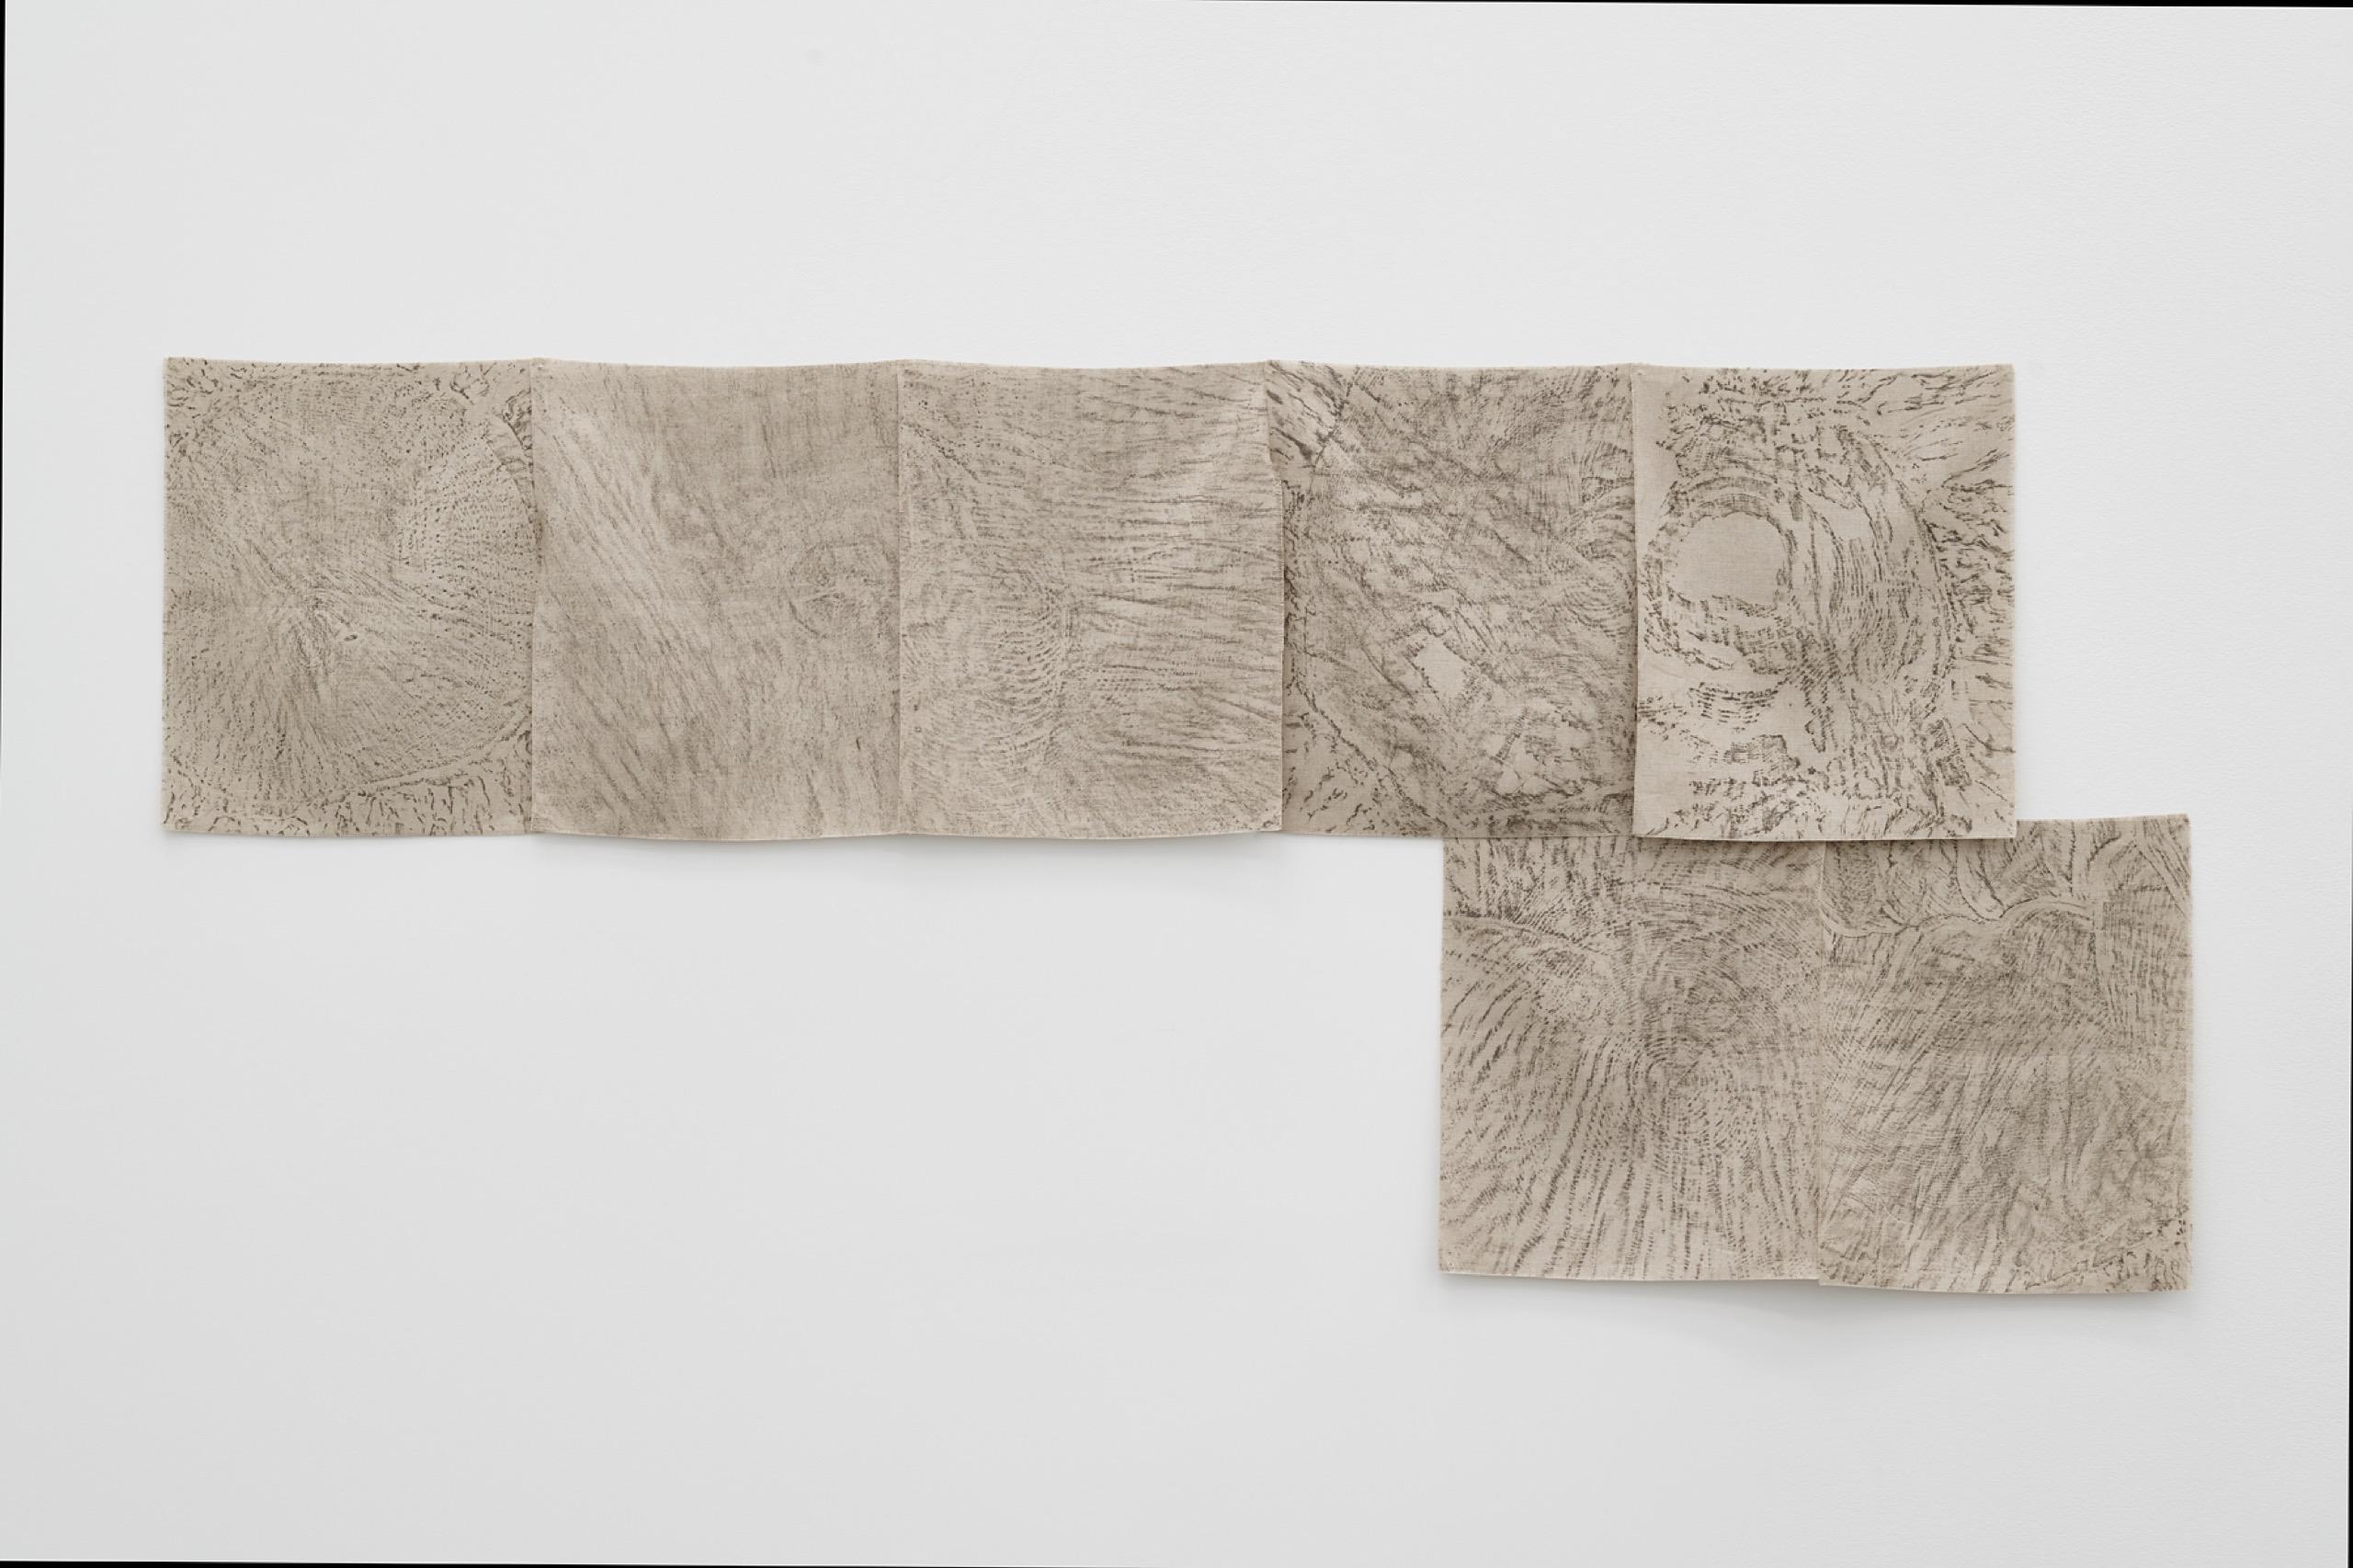 Helen Mirra, Field Recordings, 7 x 5000 Schritte, in Berlin (Hirschgarten), 22 August, 2010, Pastel oil on linen